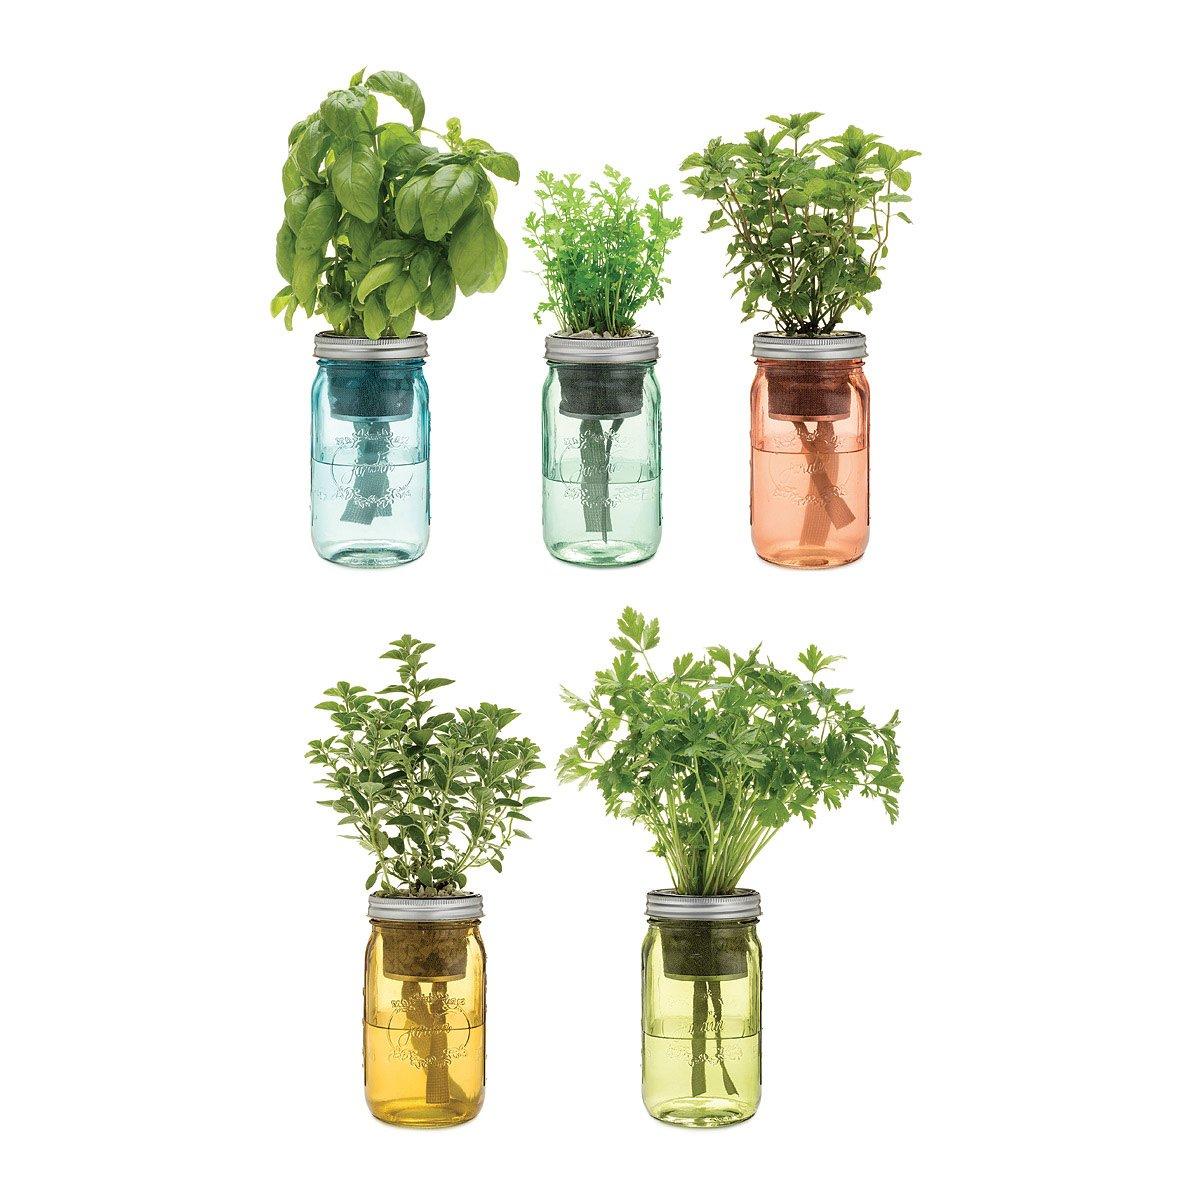 Growing Herbs Indoors From Seeds Self Watering Mason Jar Indoor Herb Garden The Green Head